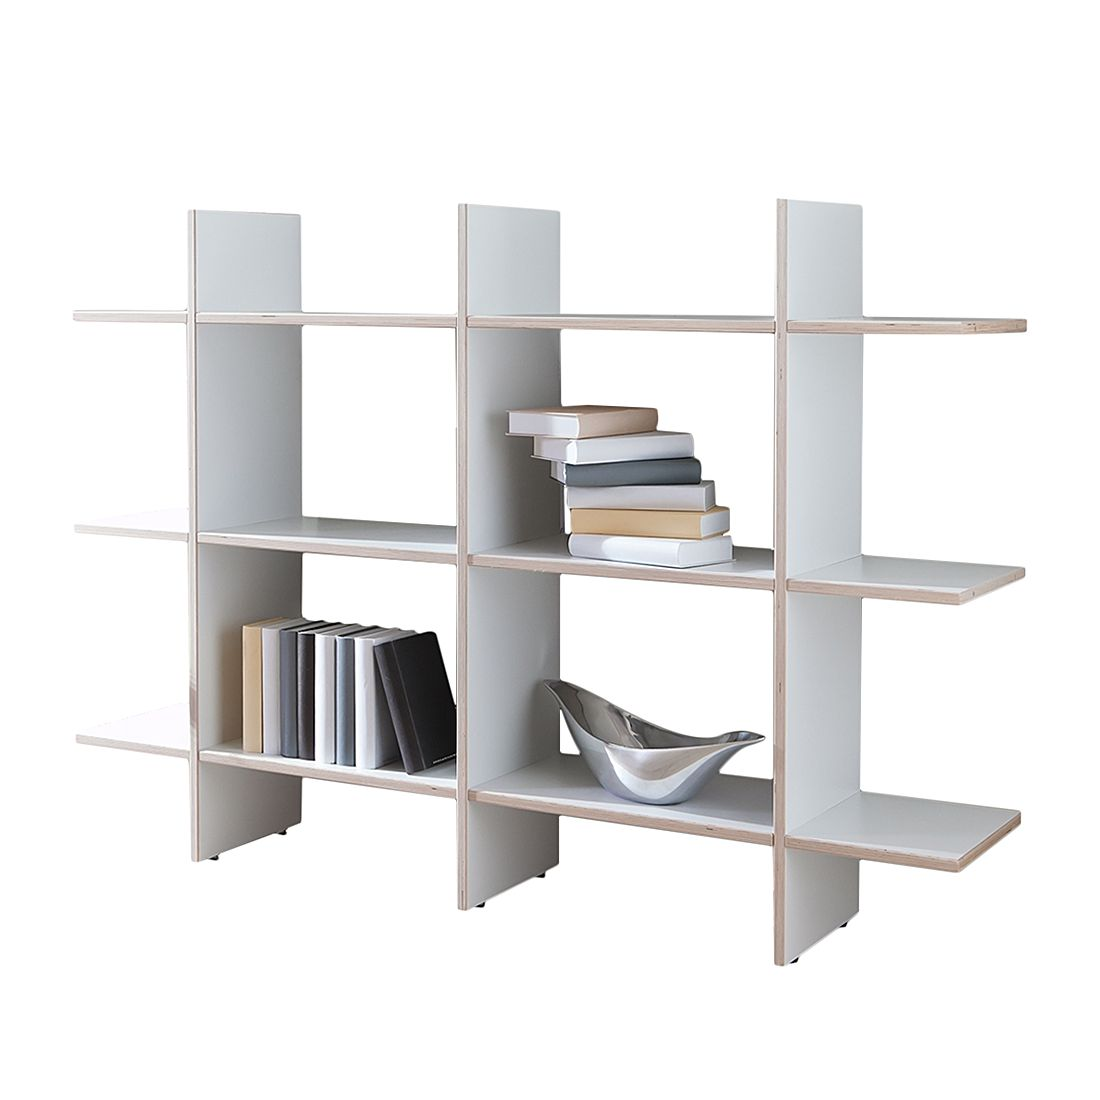 regal osmo i wei jacob jansson jetzt bestellen. Black Bedroom Furniture Sets. Home Design Ideas